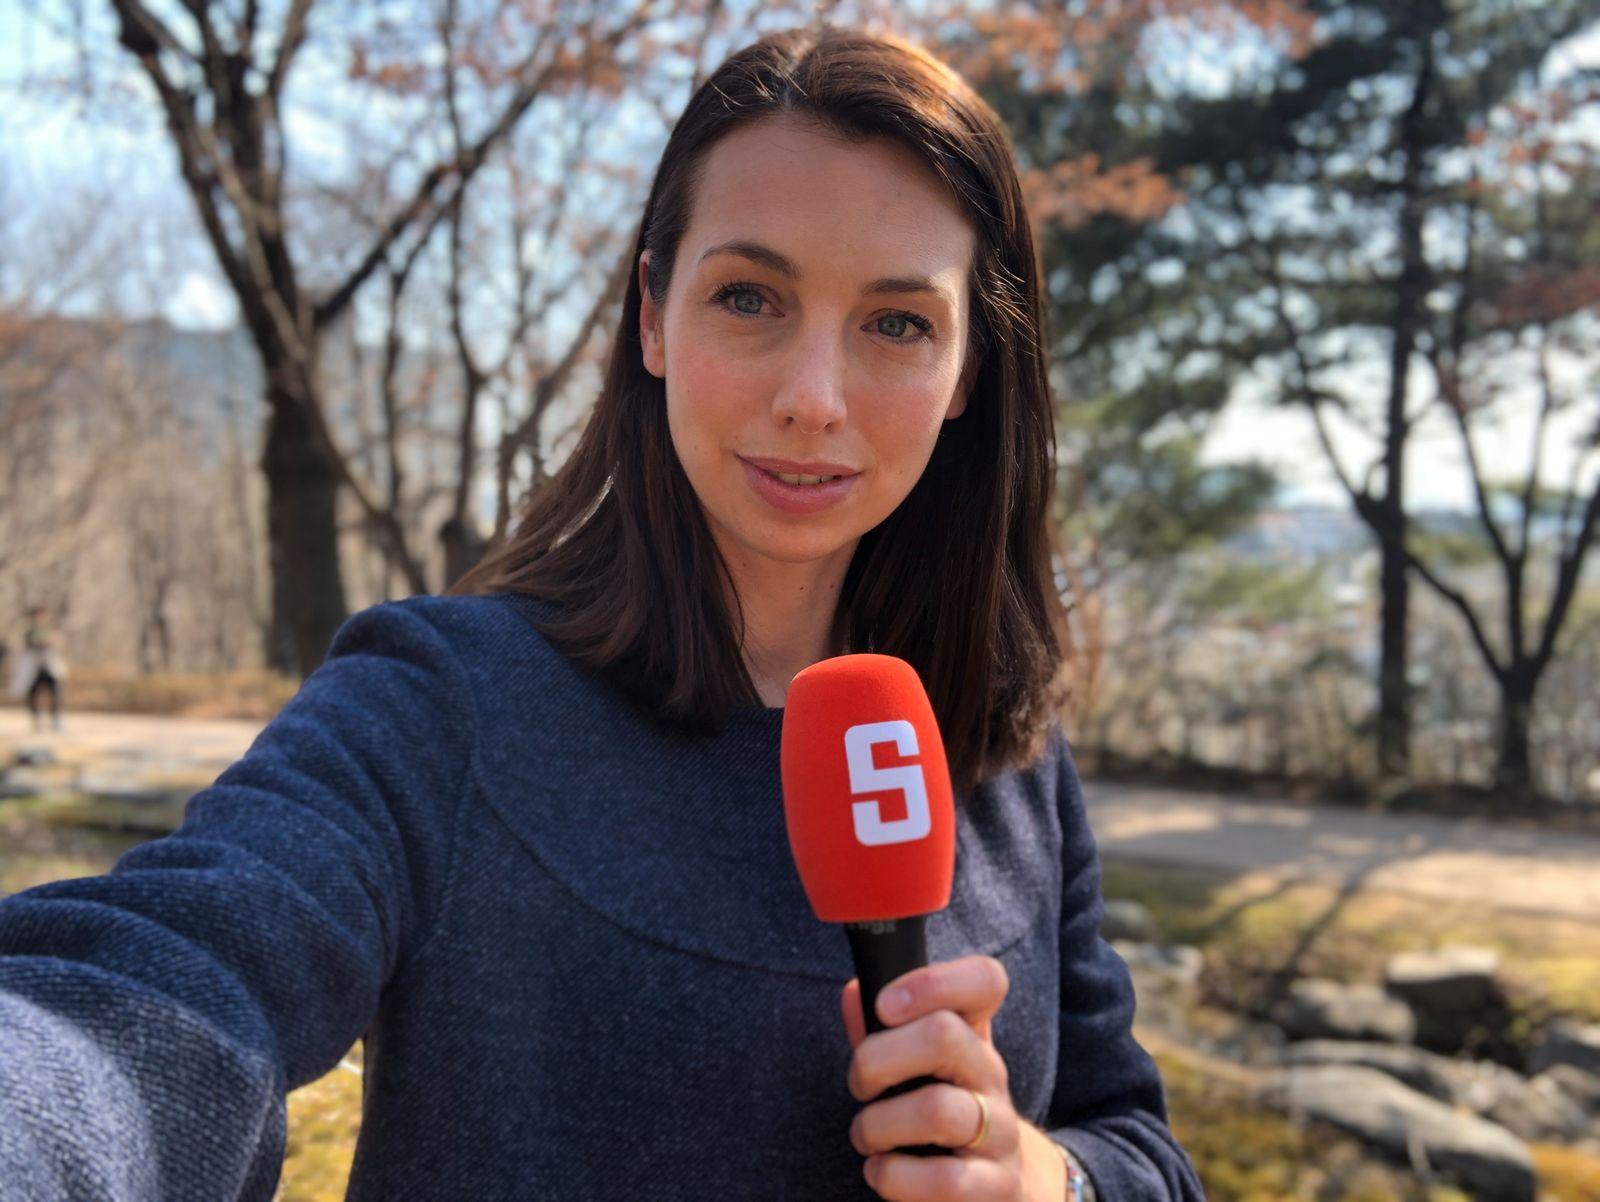 SPIEGEL-Korrespondentin Katharina Graça Peters in Seoul